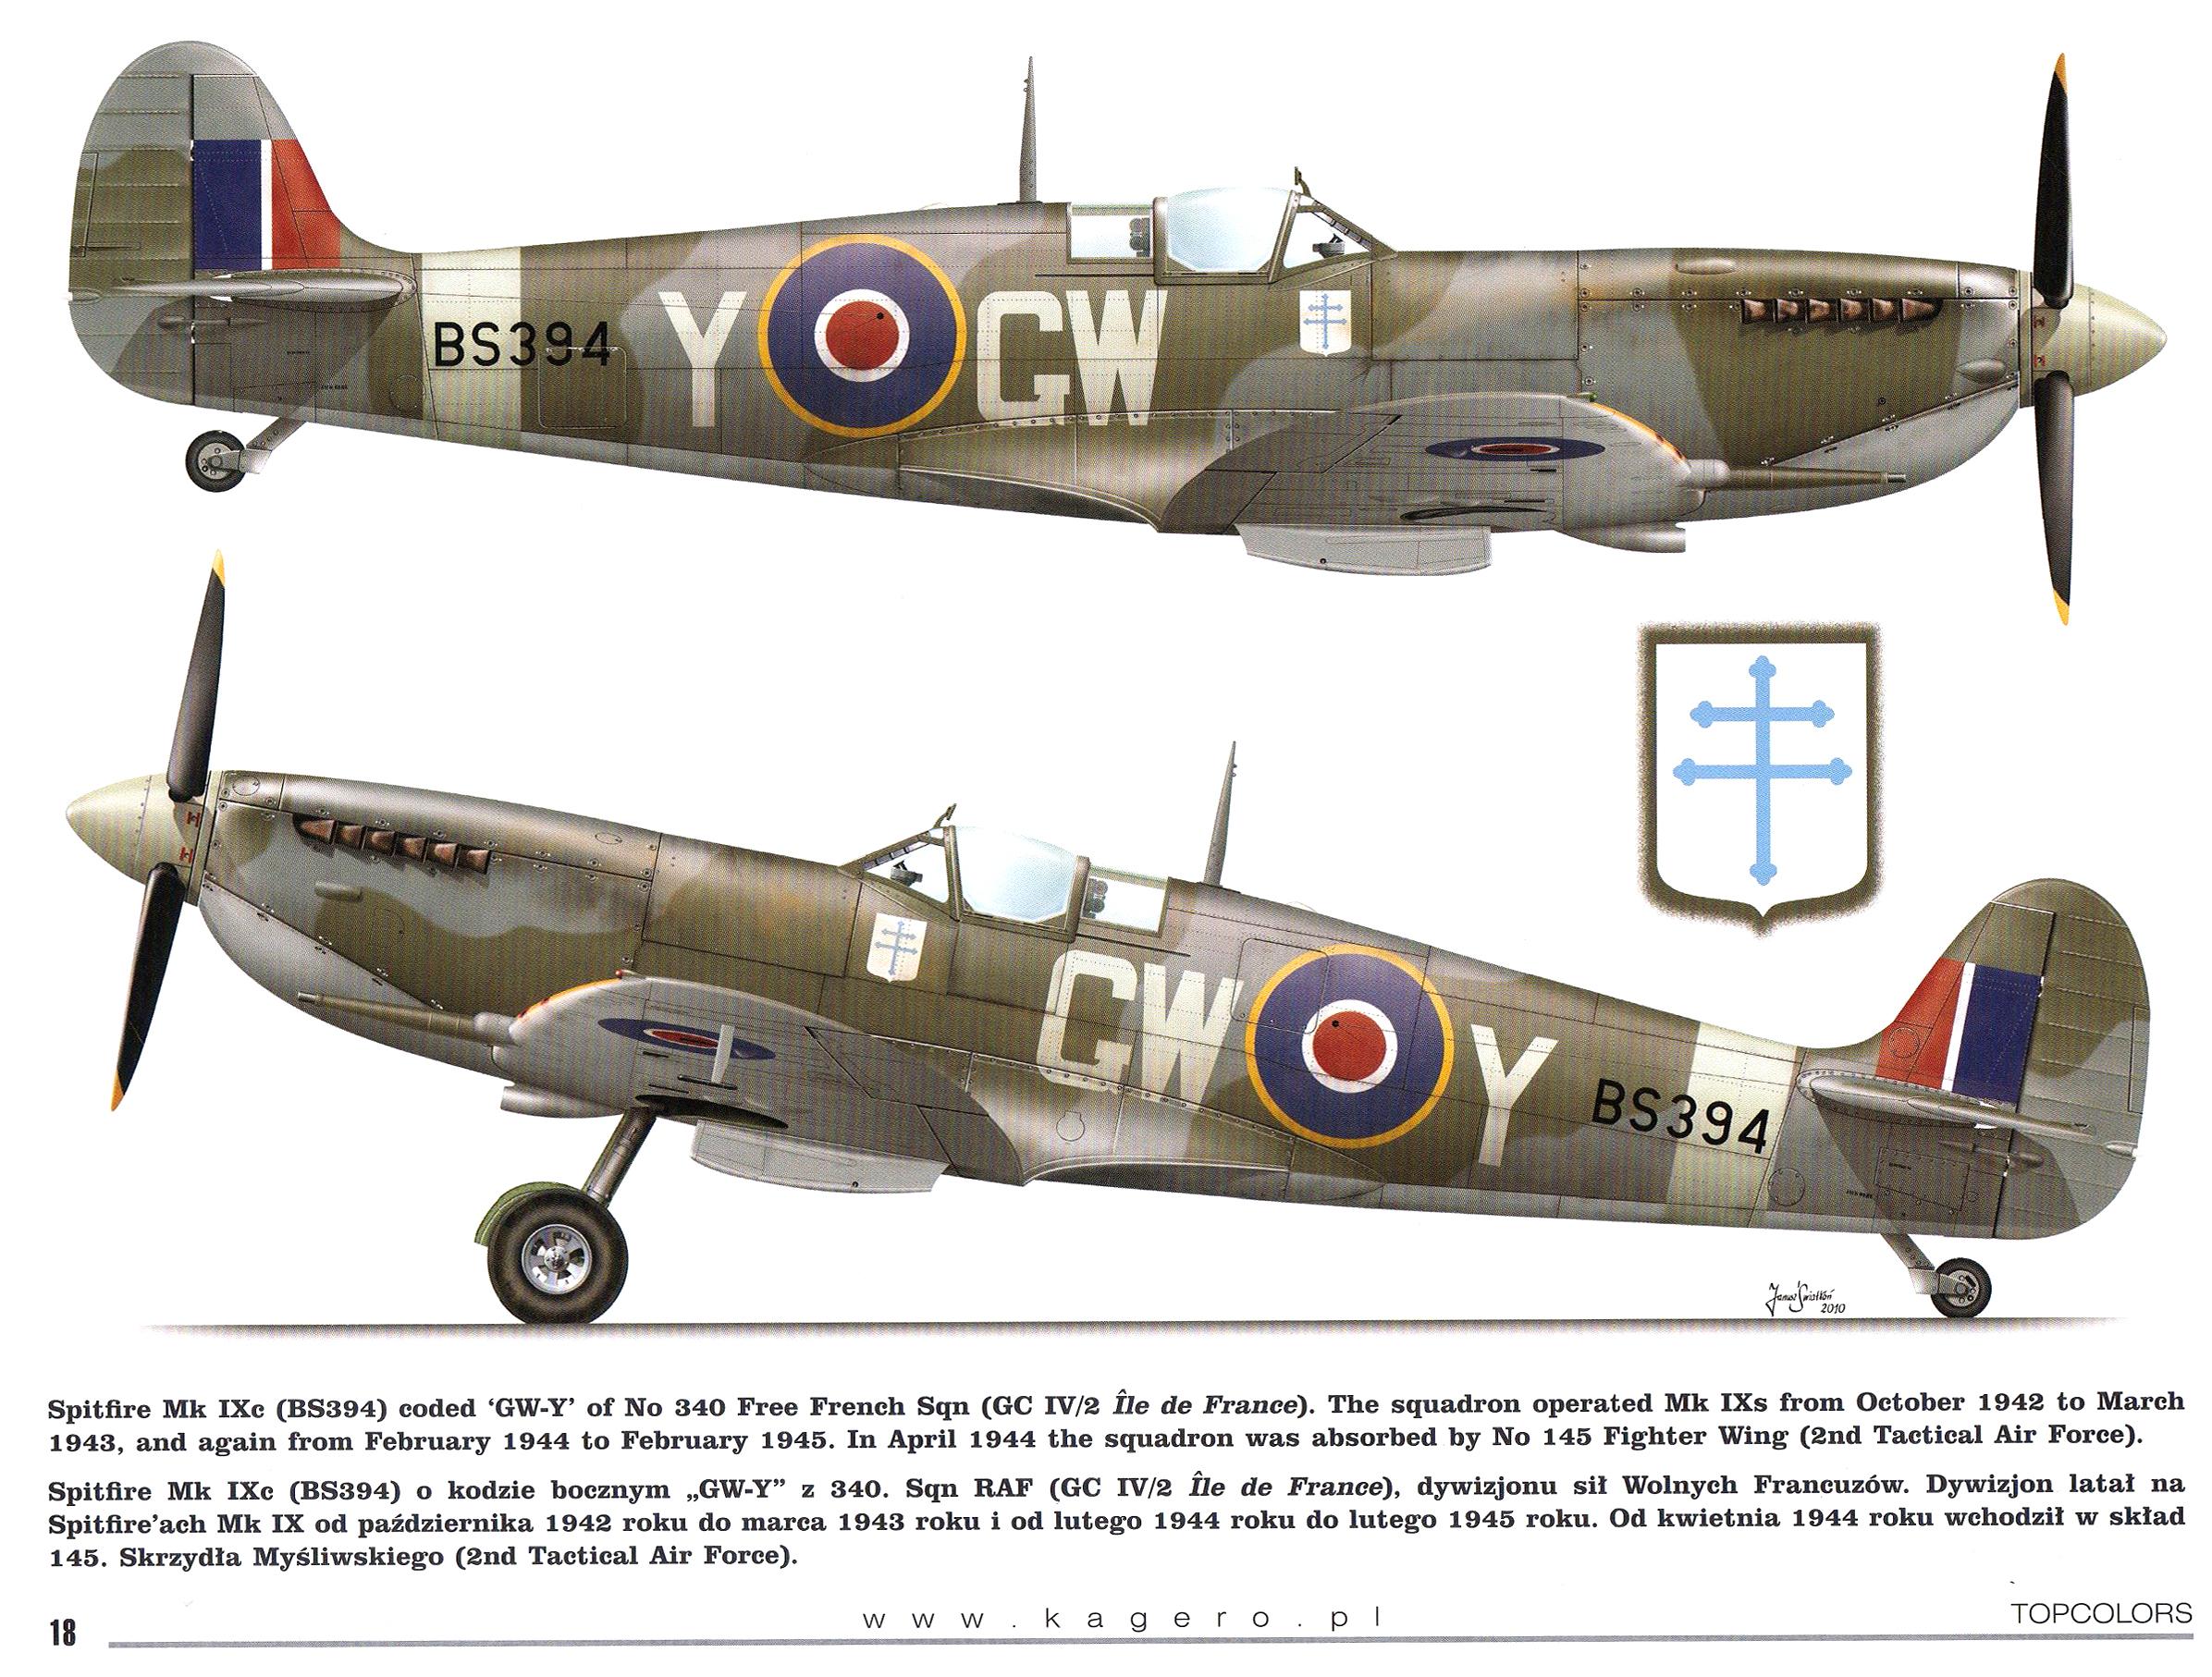 Spitfire MkIXc RAF 340Sqn GWY BS394 TC15015 Supermarine Spitfire MkIX Page 18